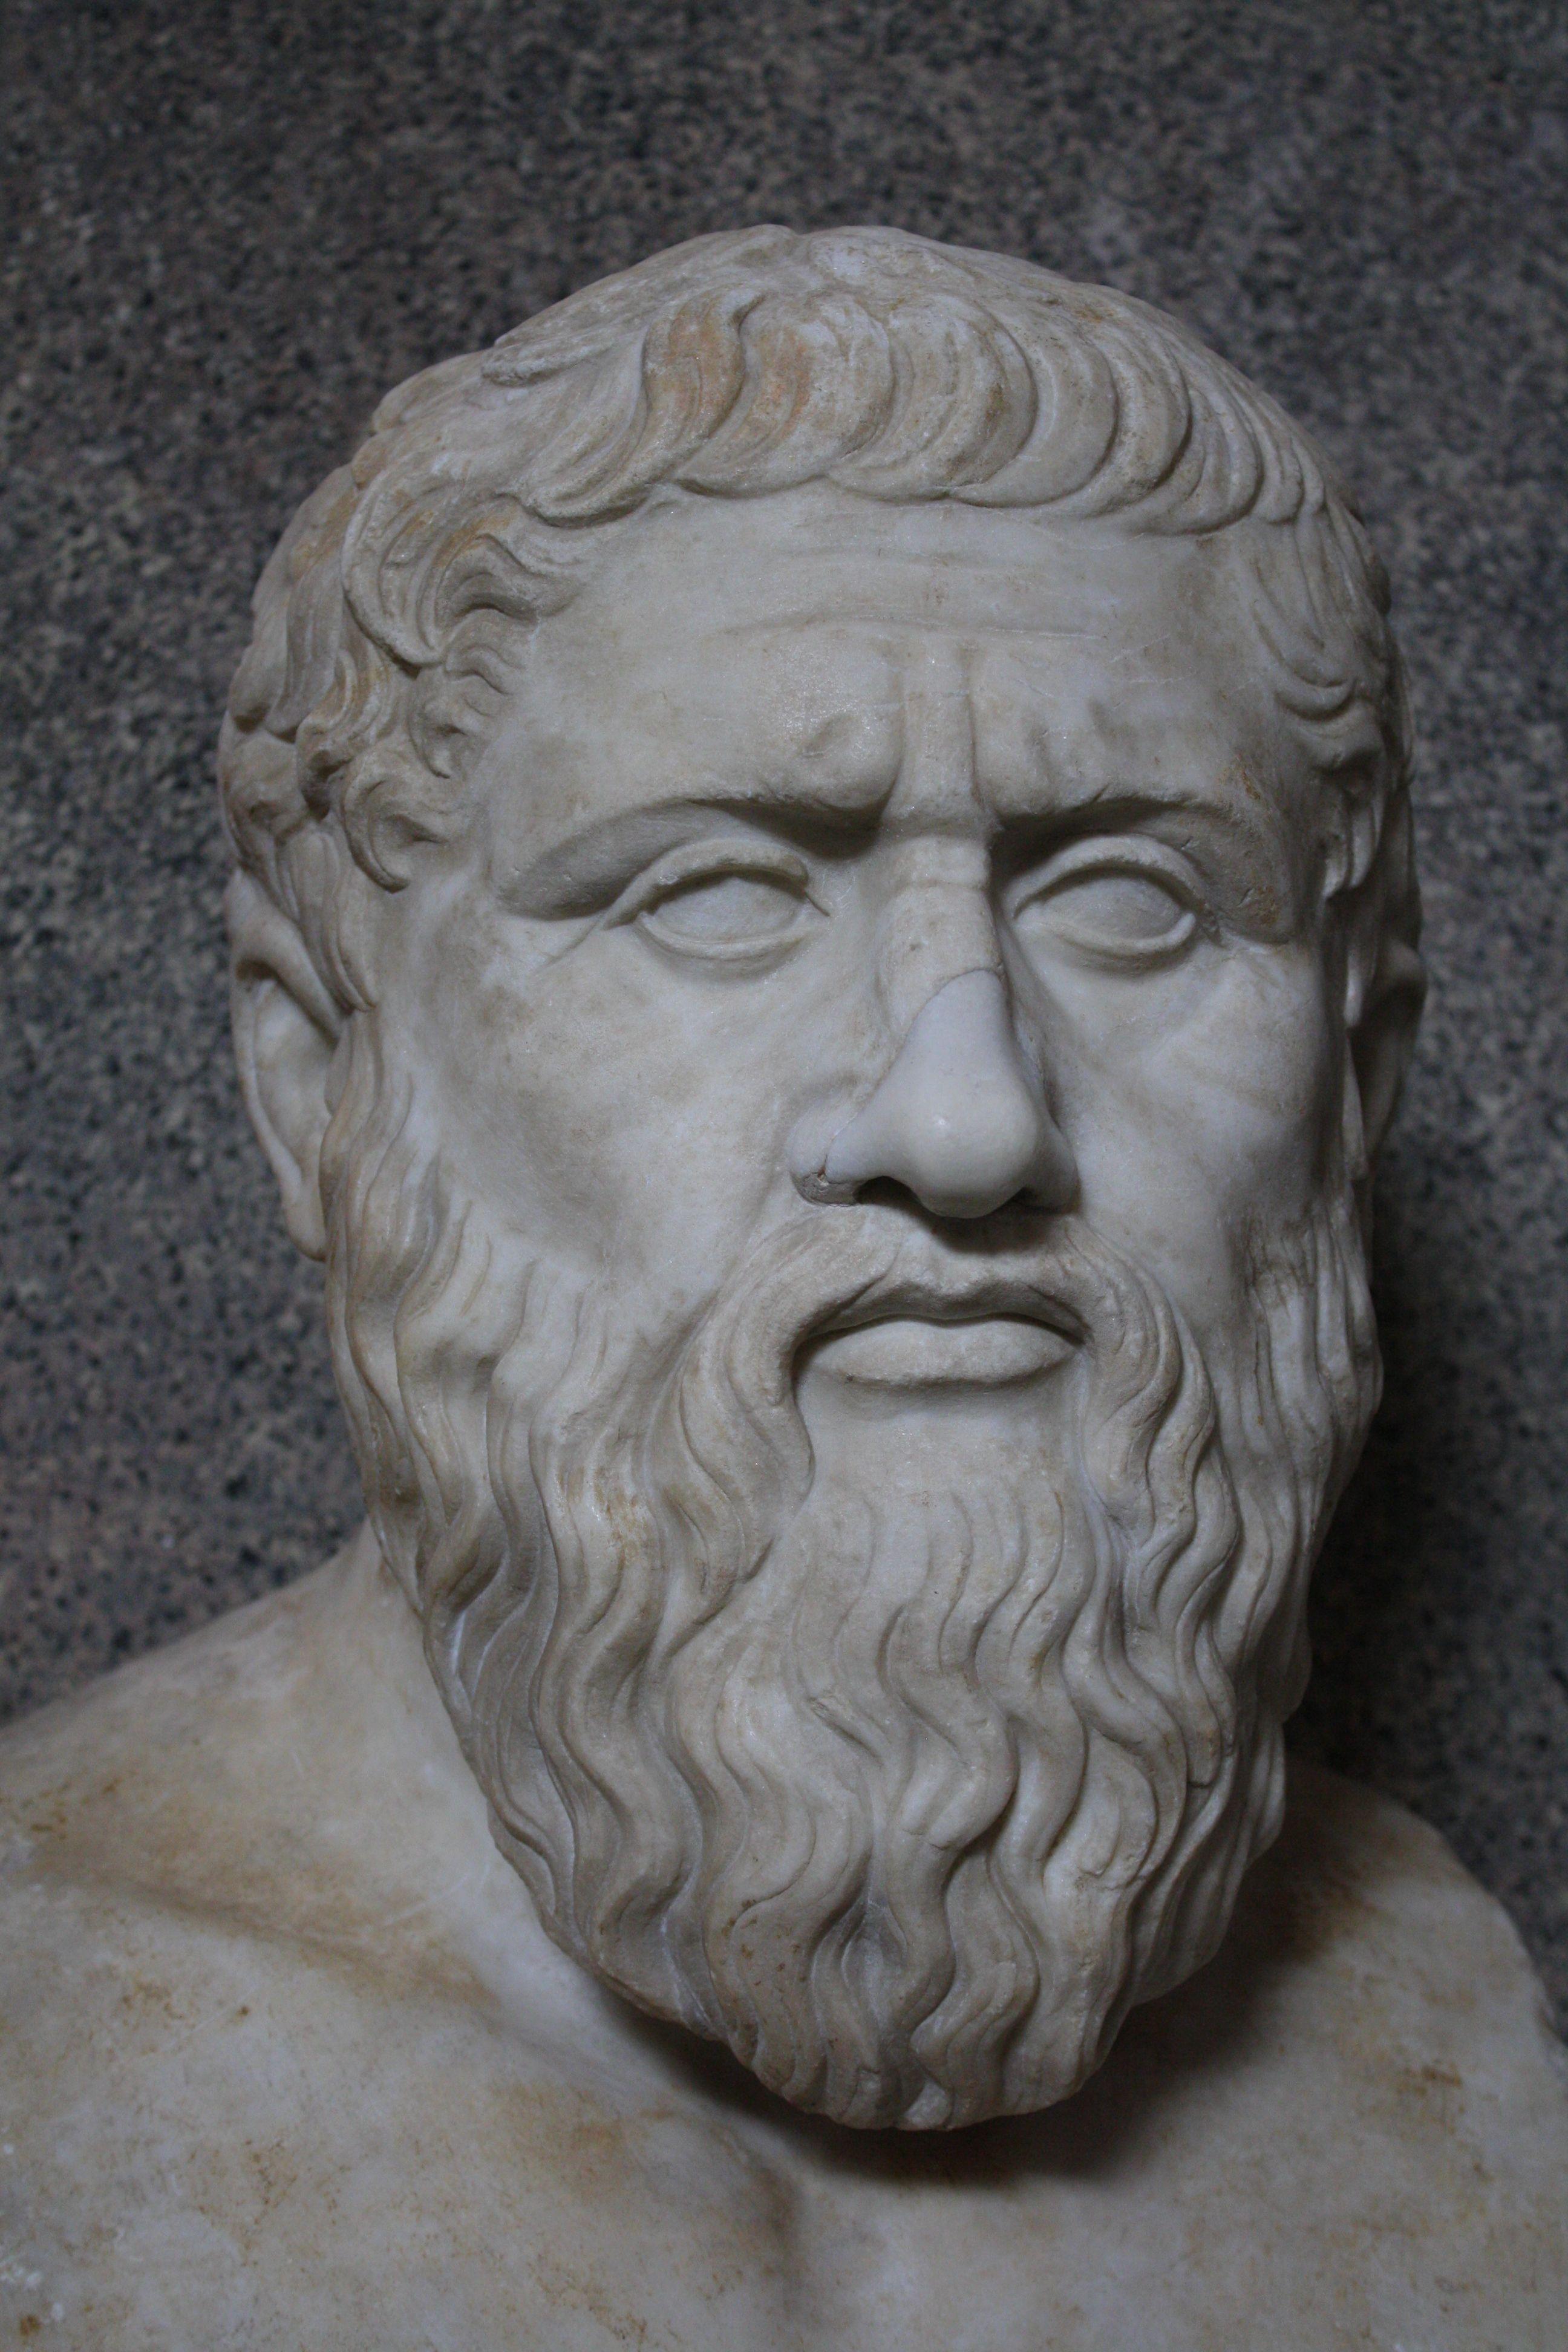 Ideias De Platão ~ Bust of the Greek philosopher Plato, mid 1st century CE copy from a 4th century BCE original